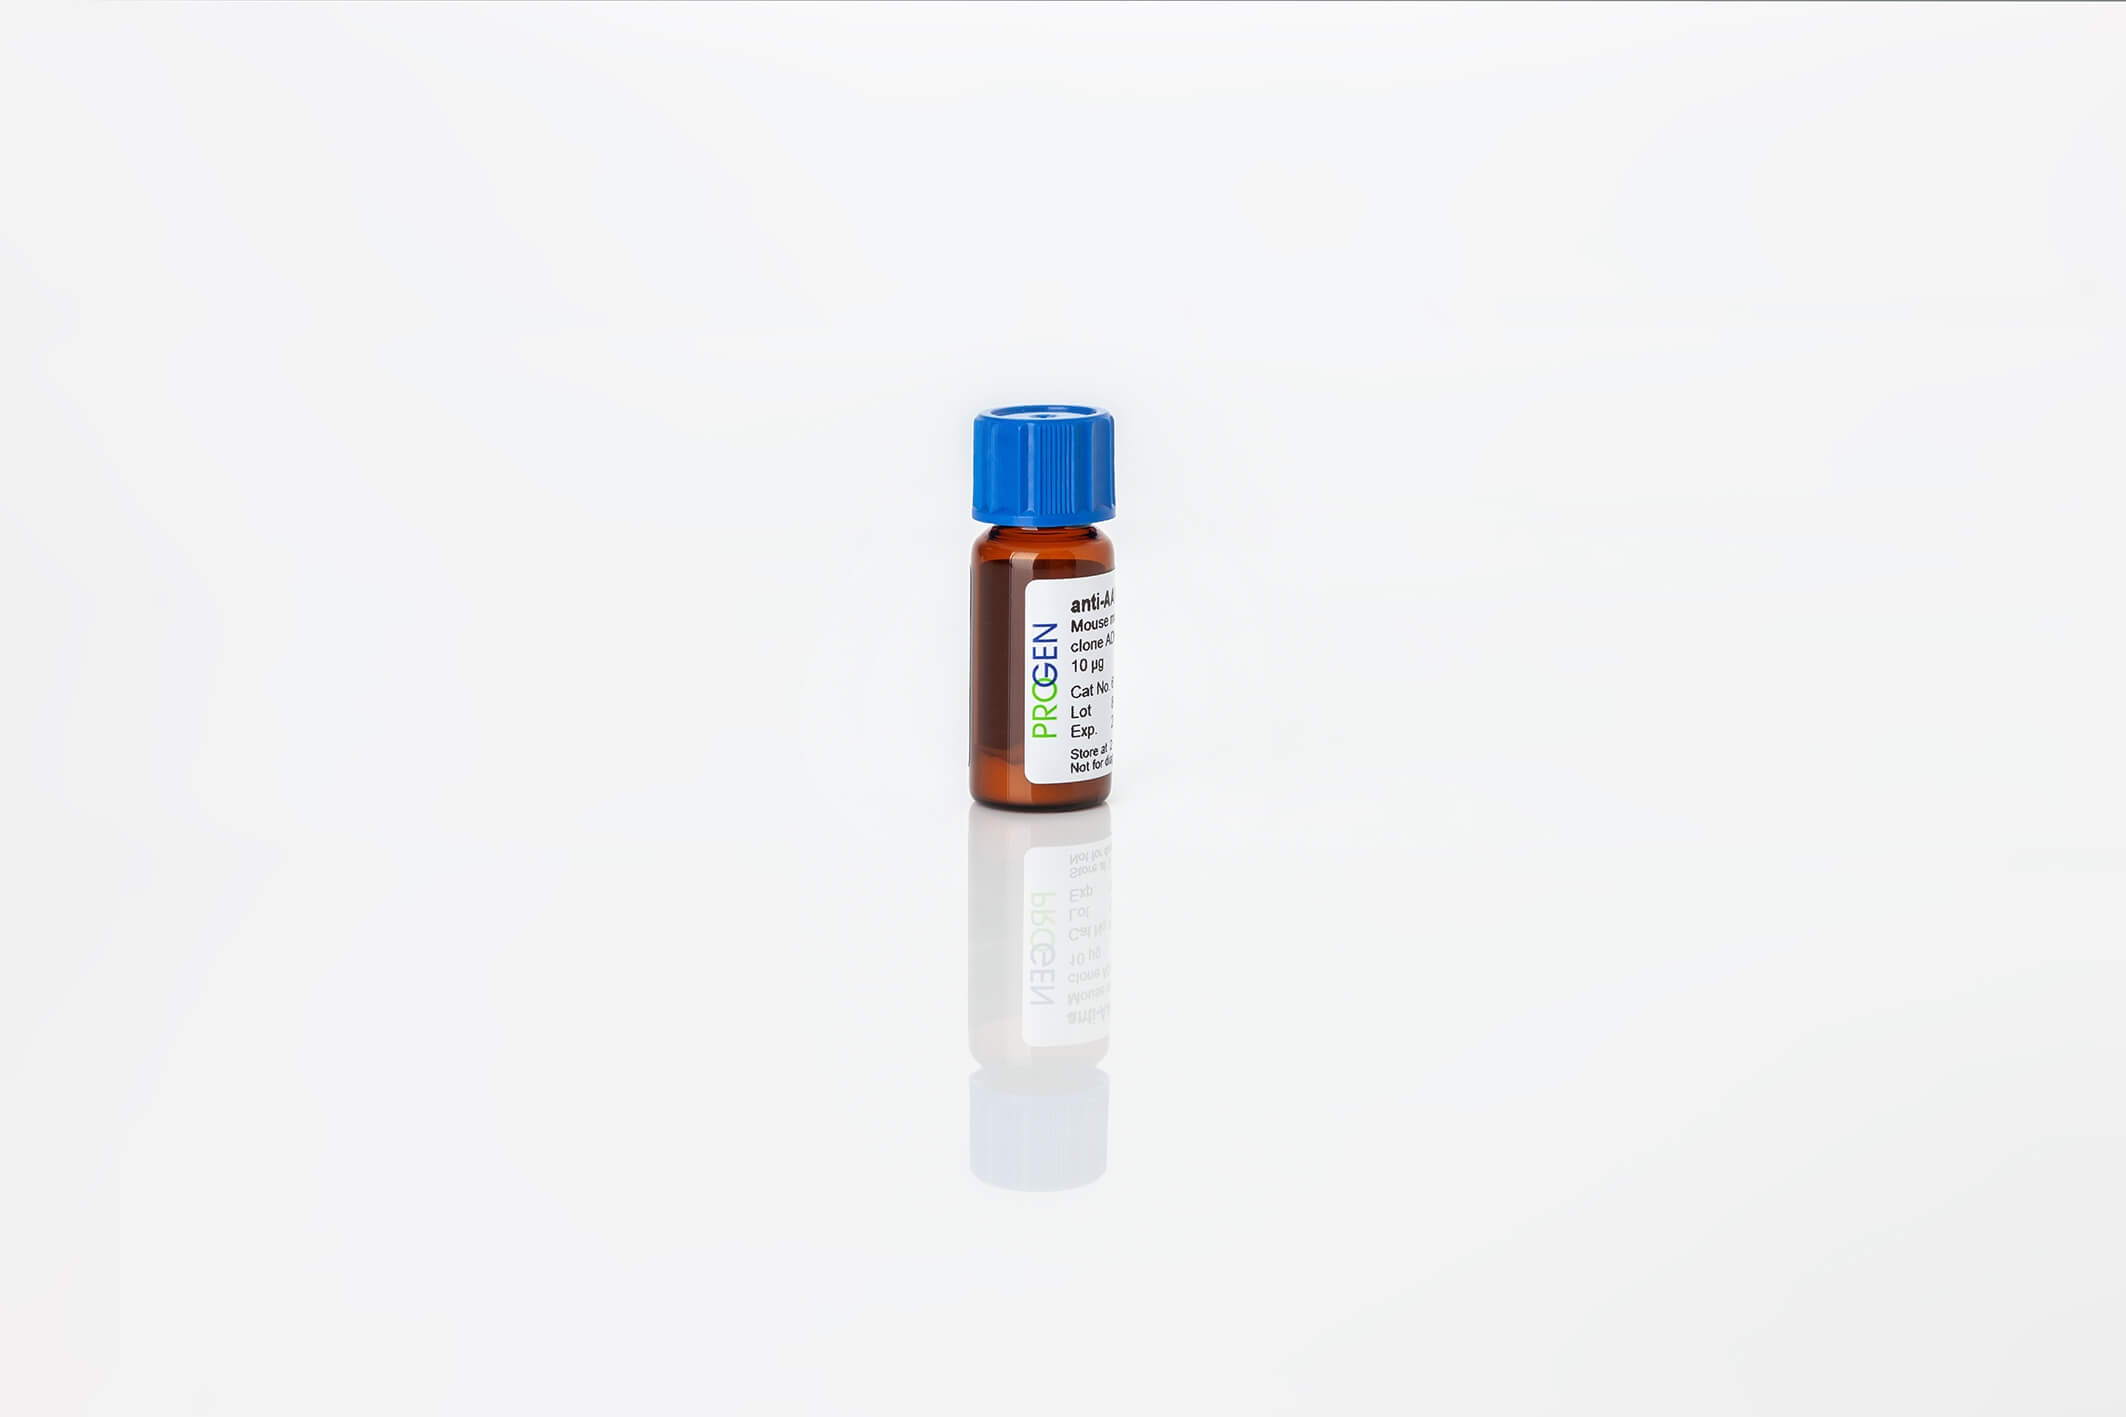 anti-Perilipin 1 (C-terminus) guinea pig polyclonal, serum